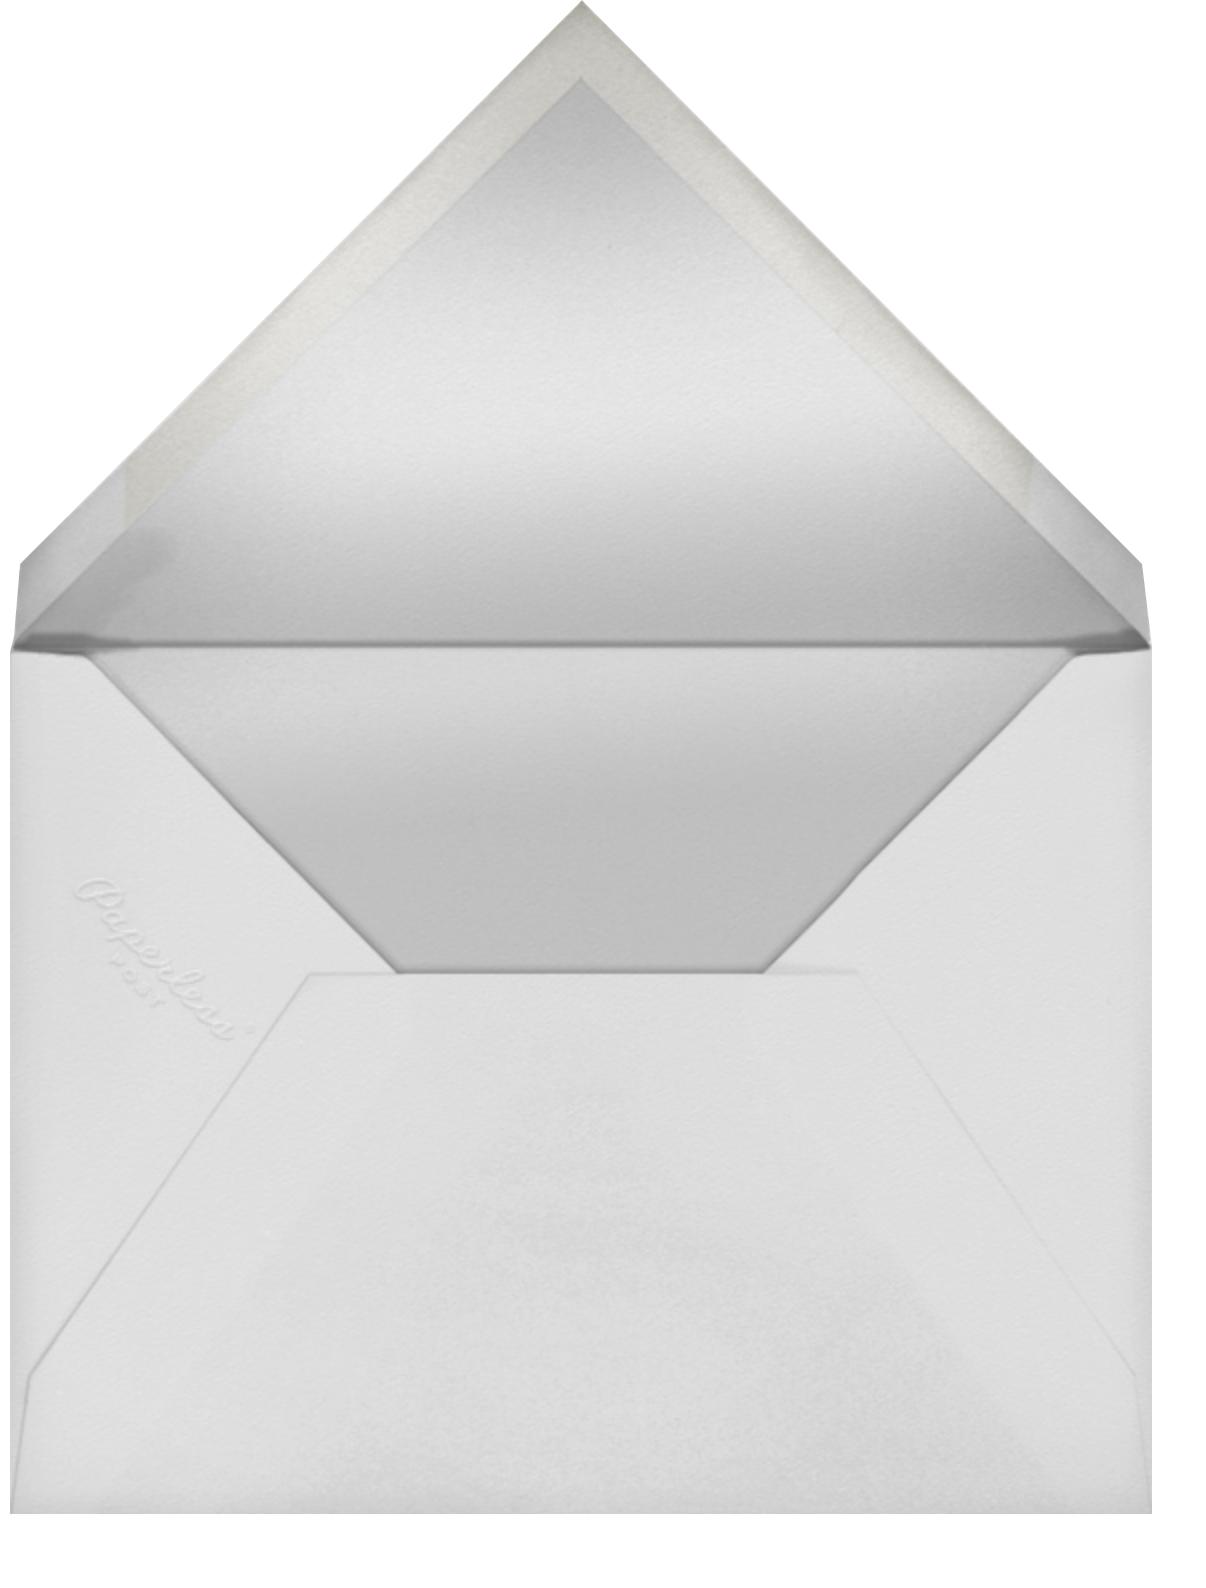 Chalkboard Happy Birthday - Paperless Post - Free birthday eCards - envelope back